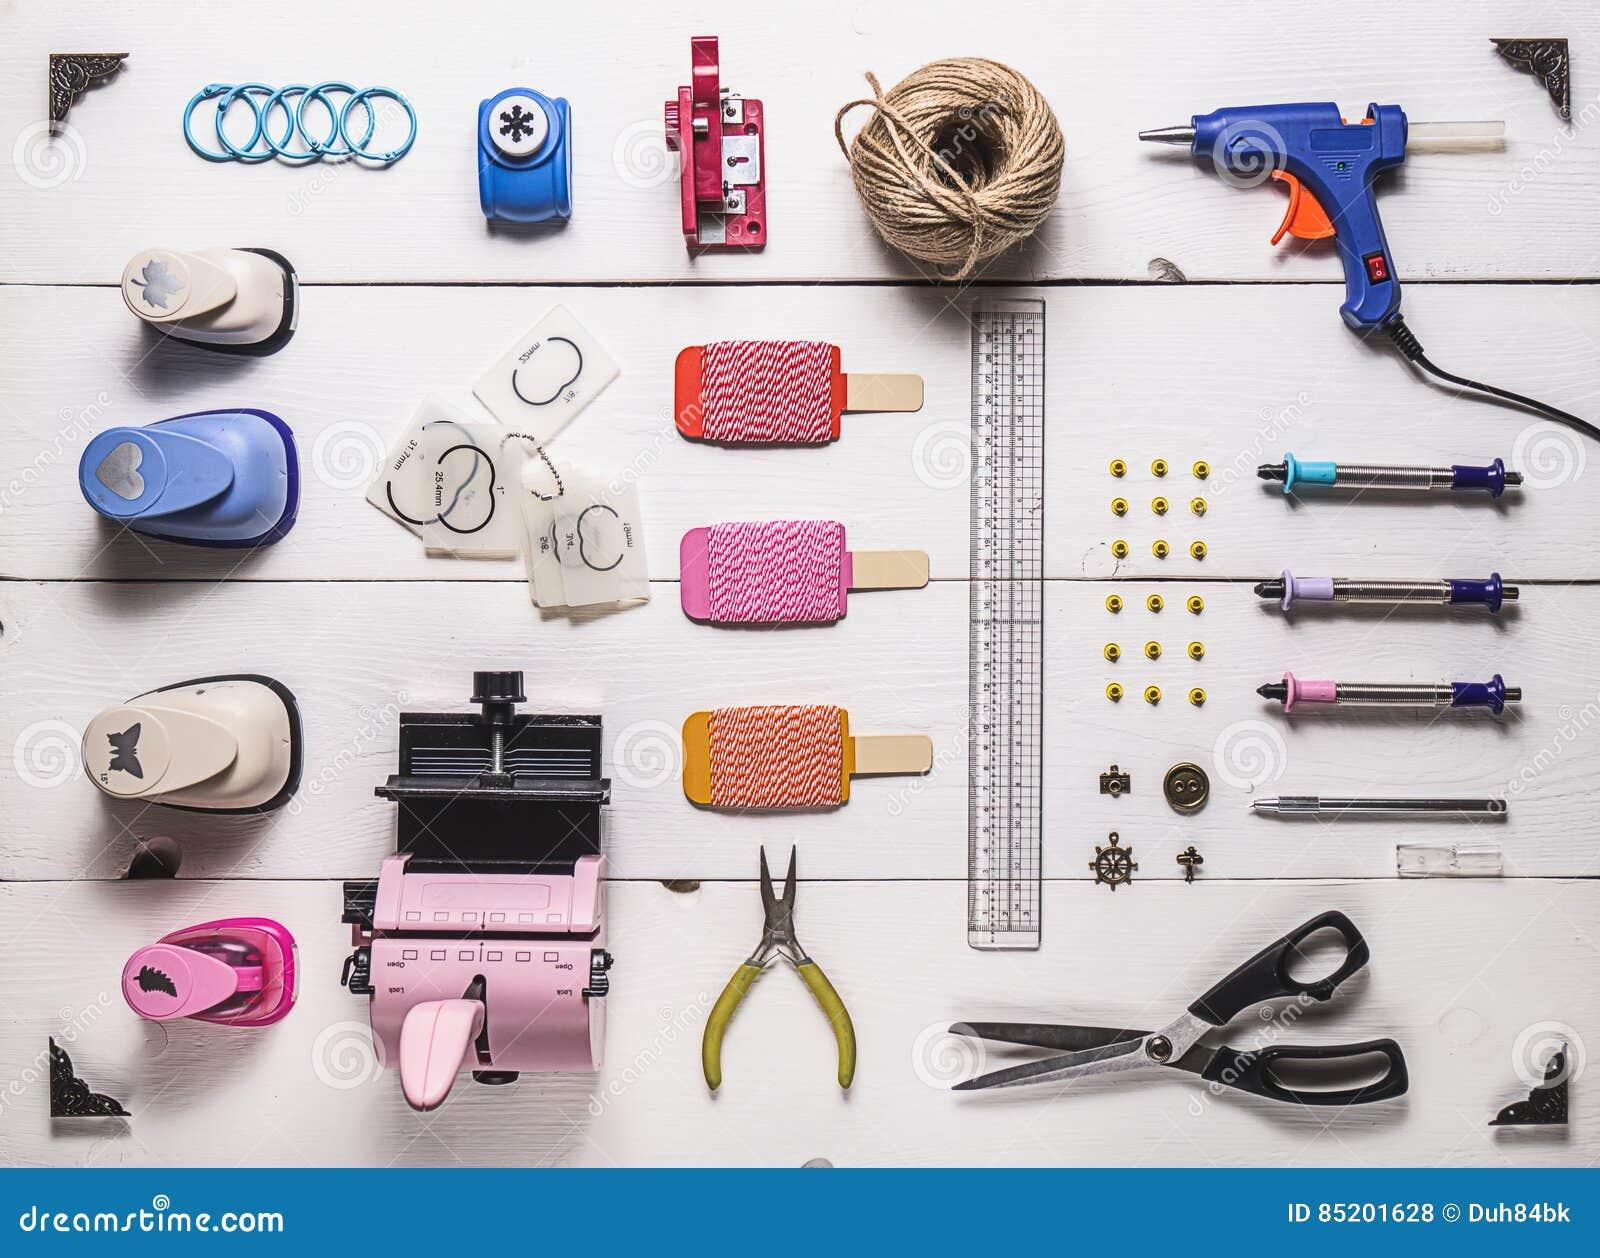 Scrapbooking Tools Stock Photo Image Of Element Decorative 85201628